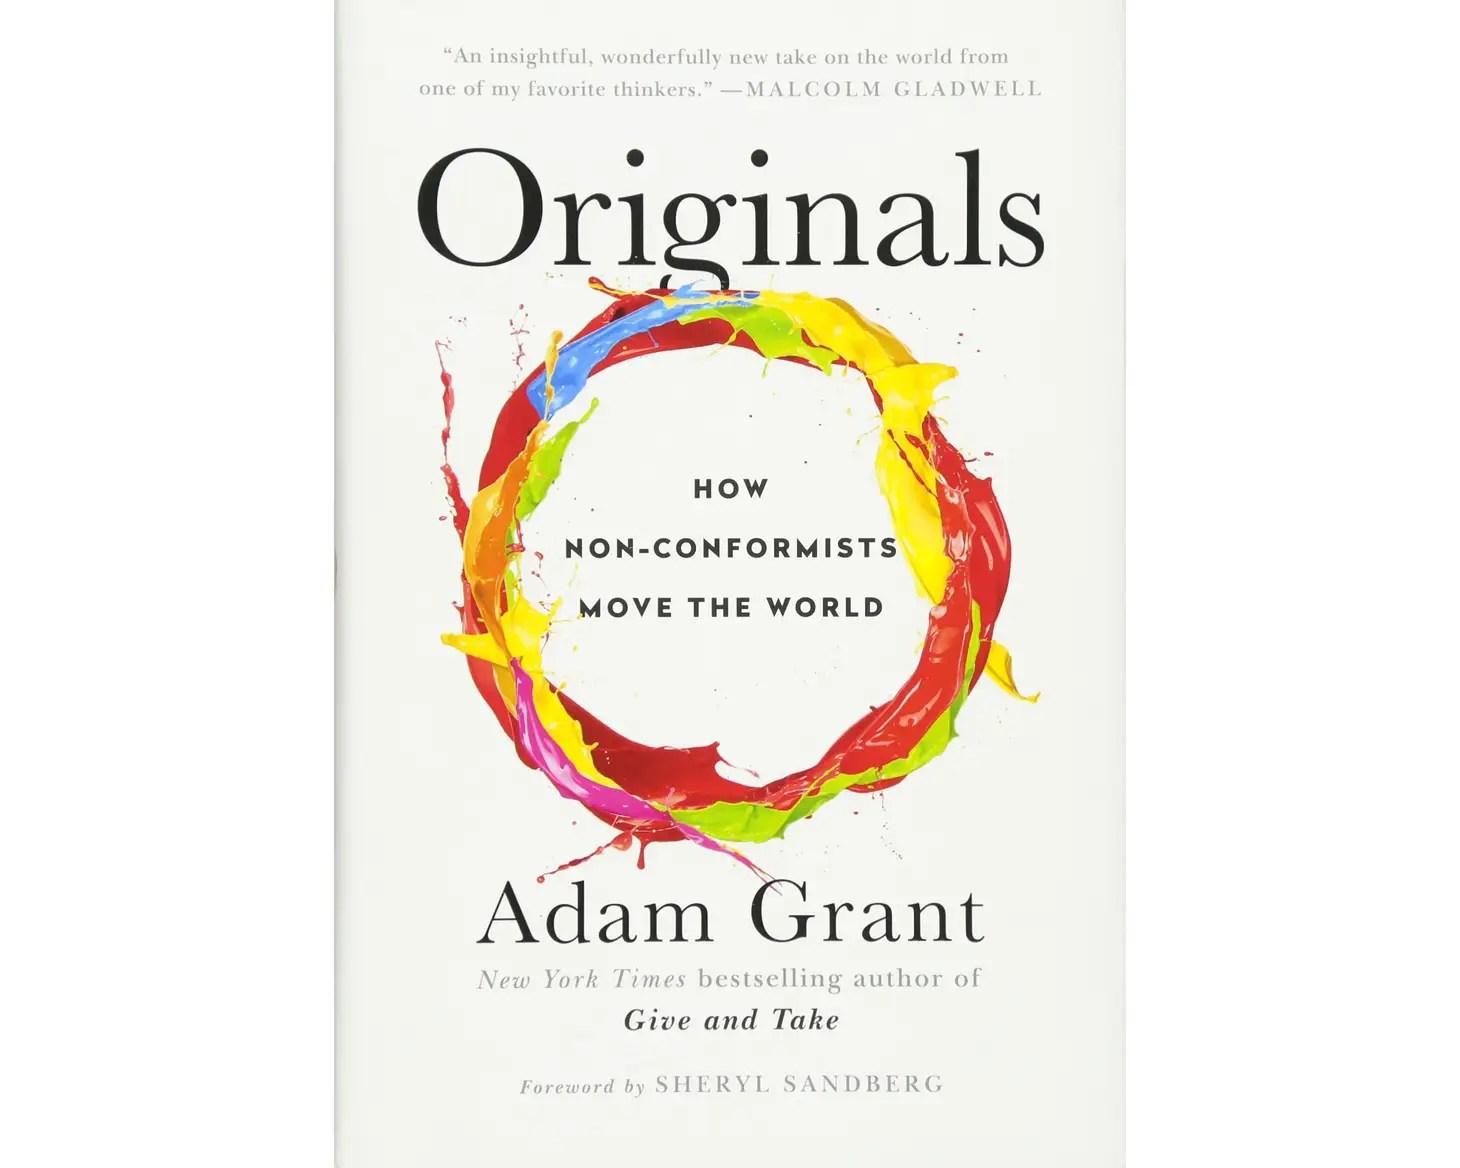 """Originals: How Non-Conformists Move the World"" by Adam Grant"